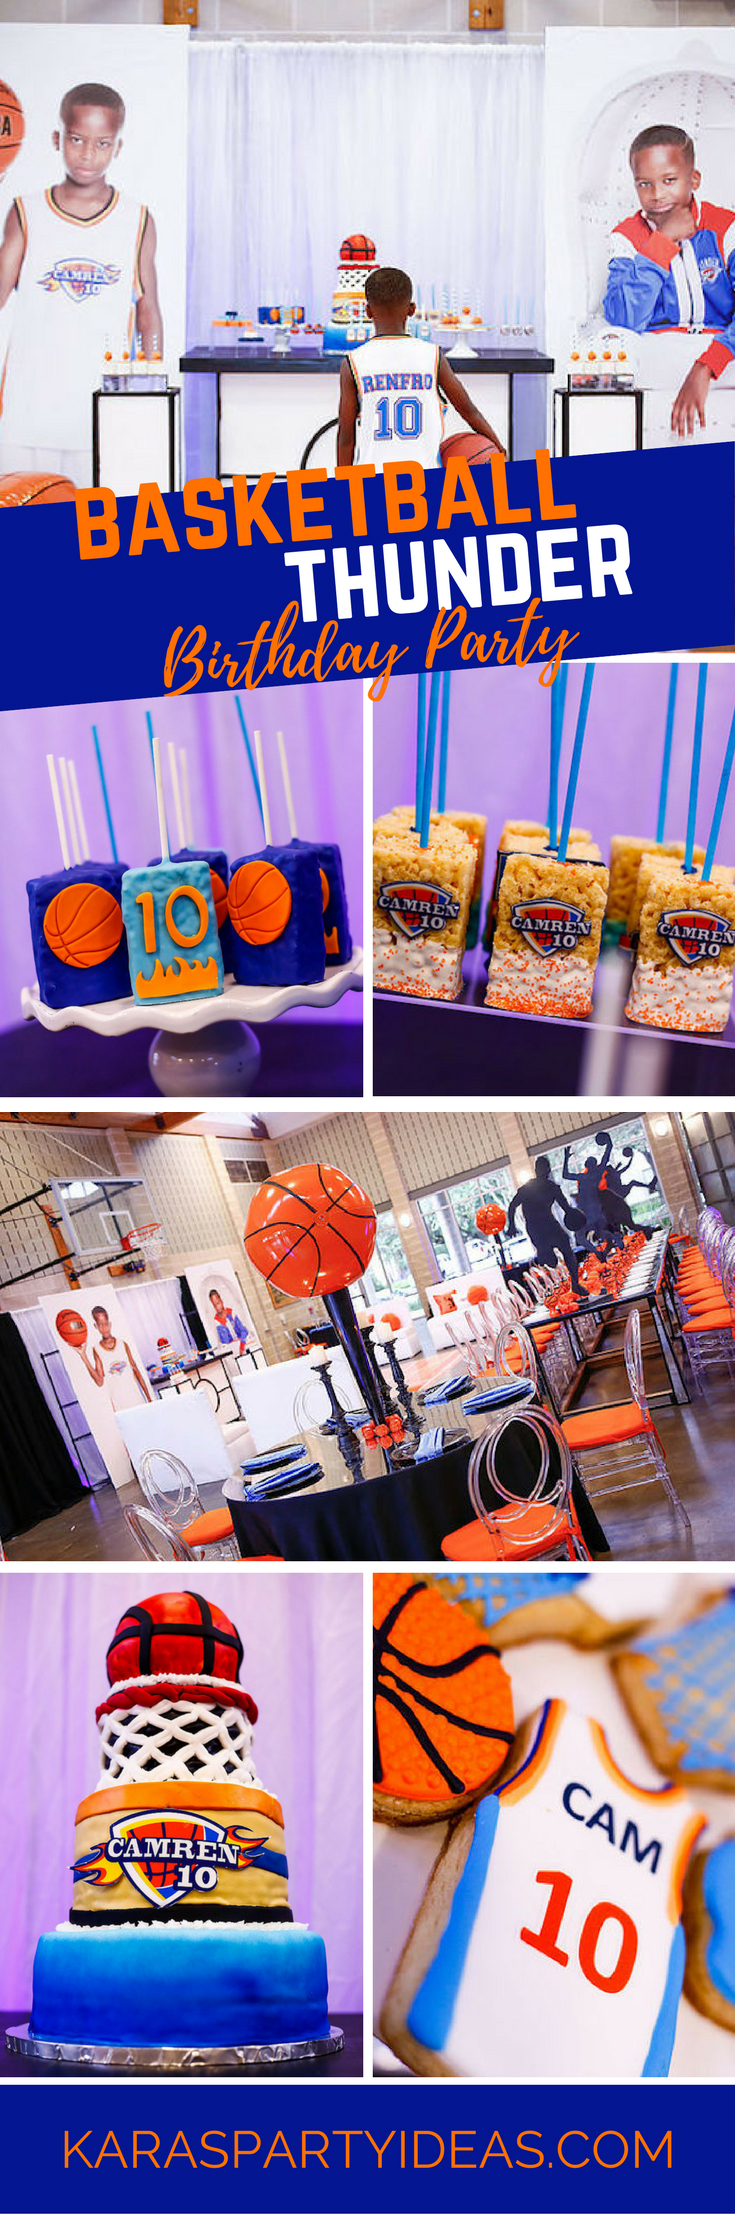 Basketball Thunder Birthday Party via Kara's Party Ideas - KarasPartyIdeas.com